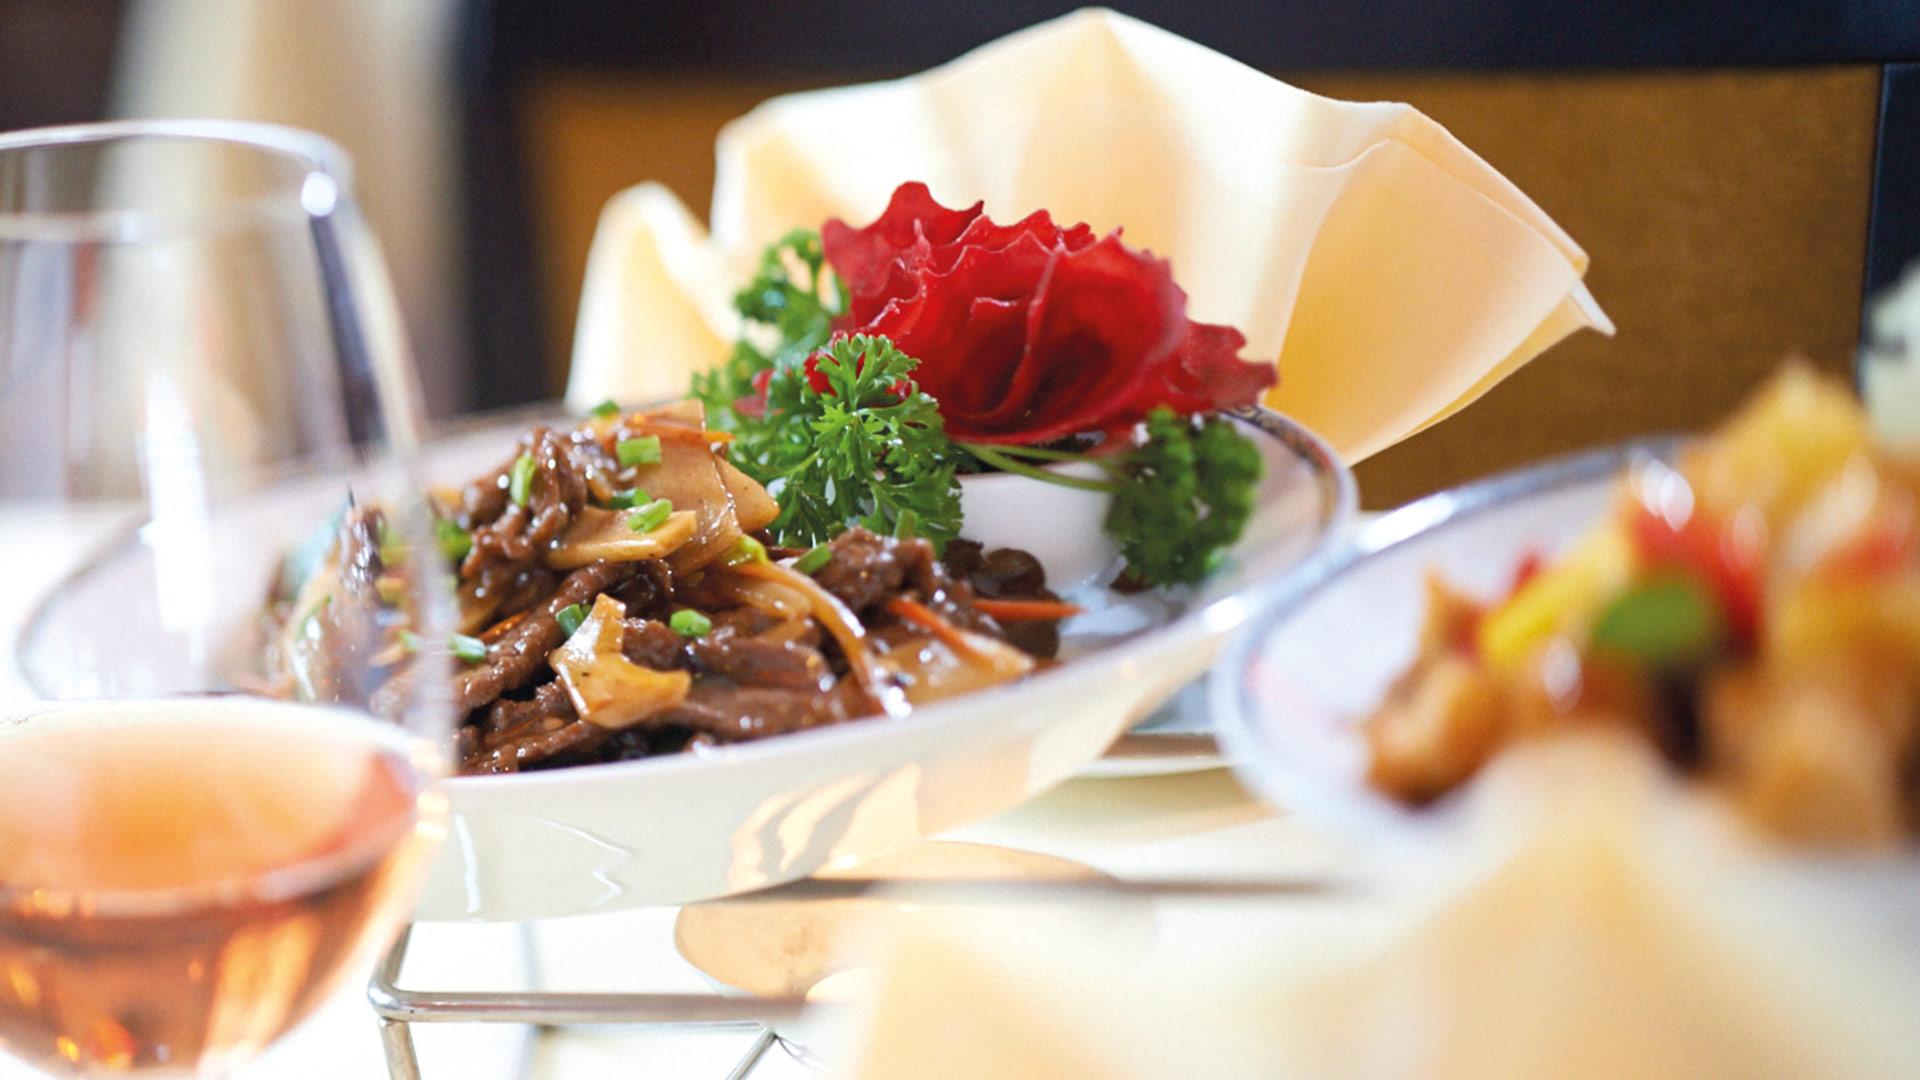 krone-thun-china-restaurant-gericht.jpg